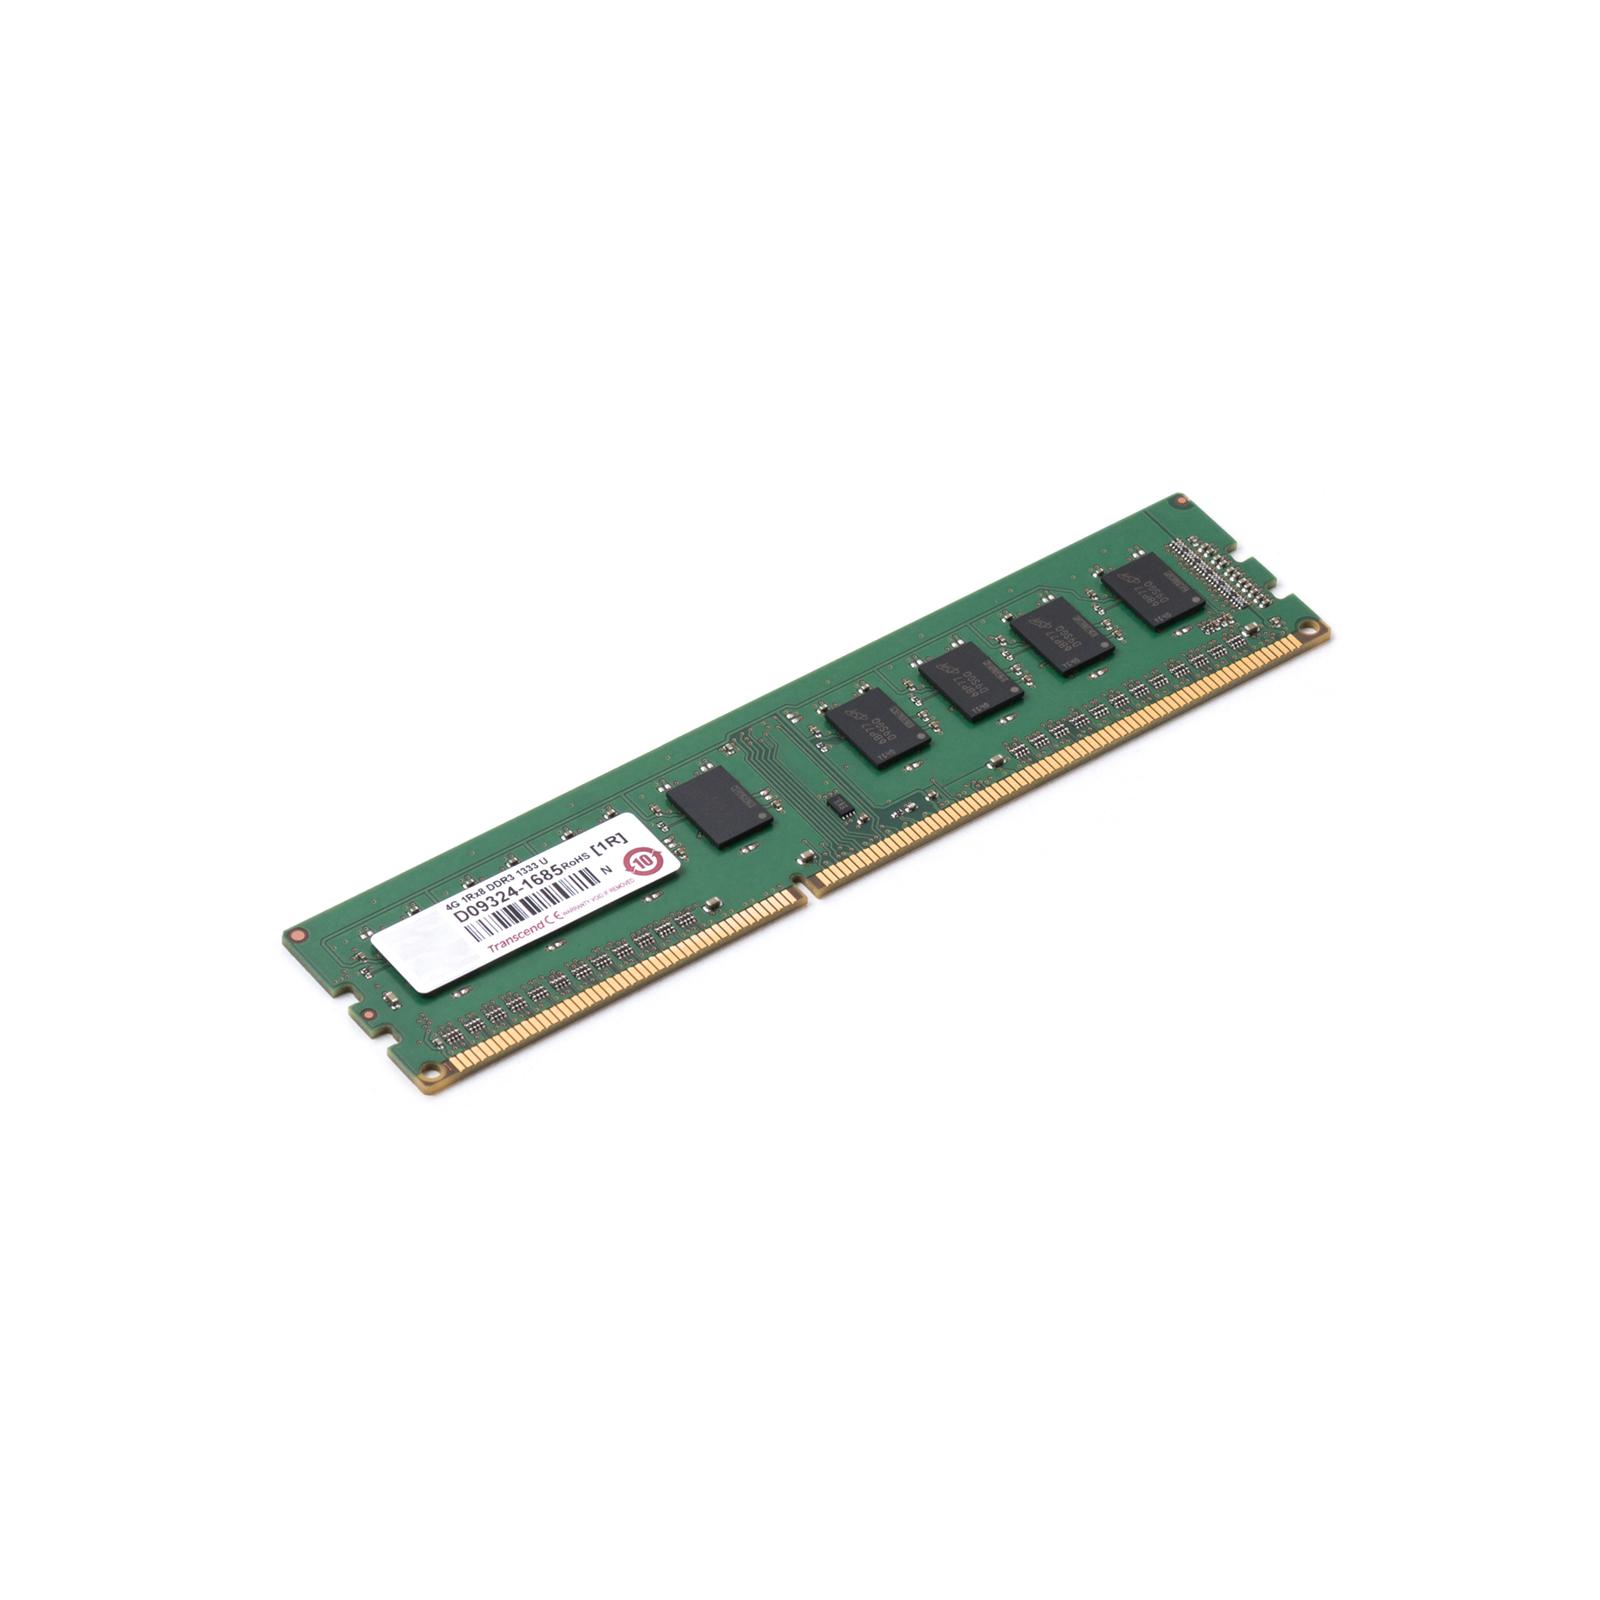 Модуль памяти для компьютера DDR3 4GB 1333 MHz Transcend (JM1333KLH-4G / JM1333KLN-4G) изображение 2